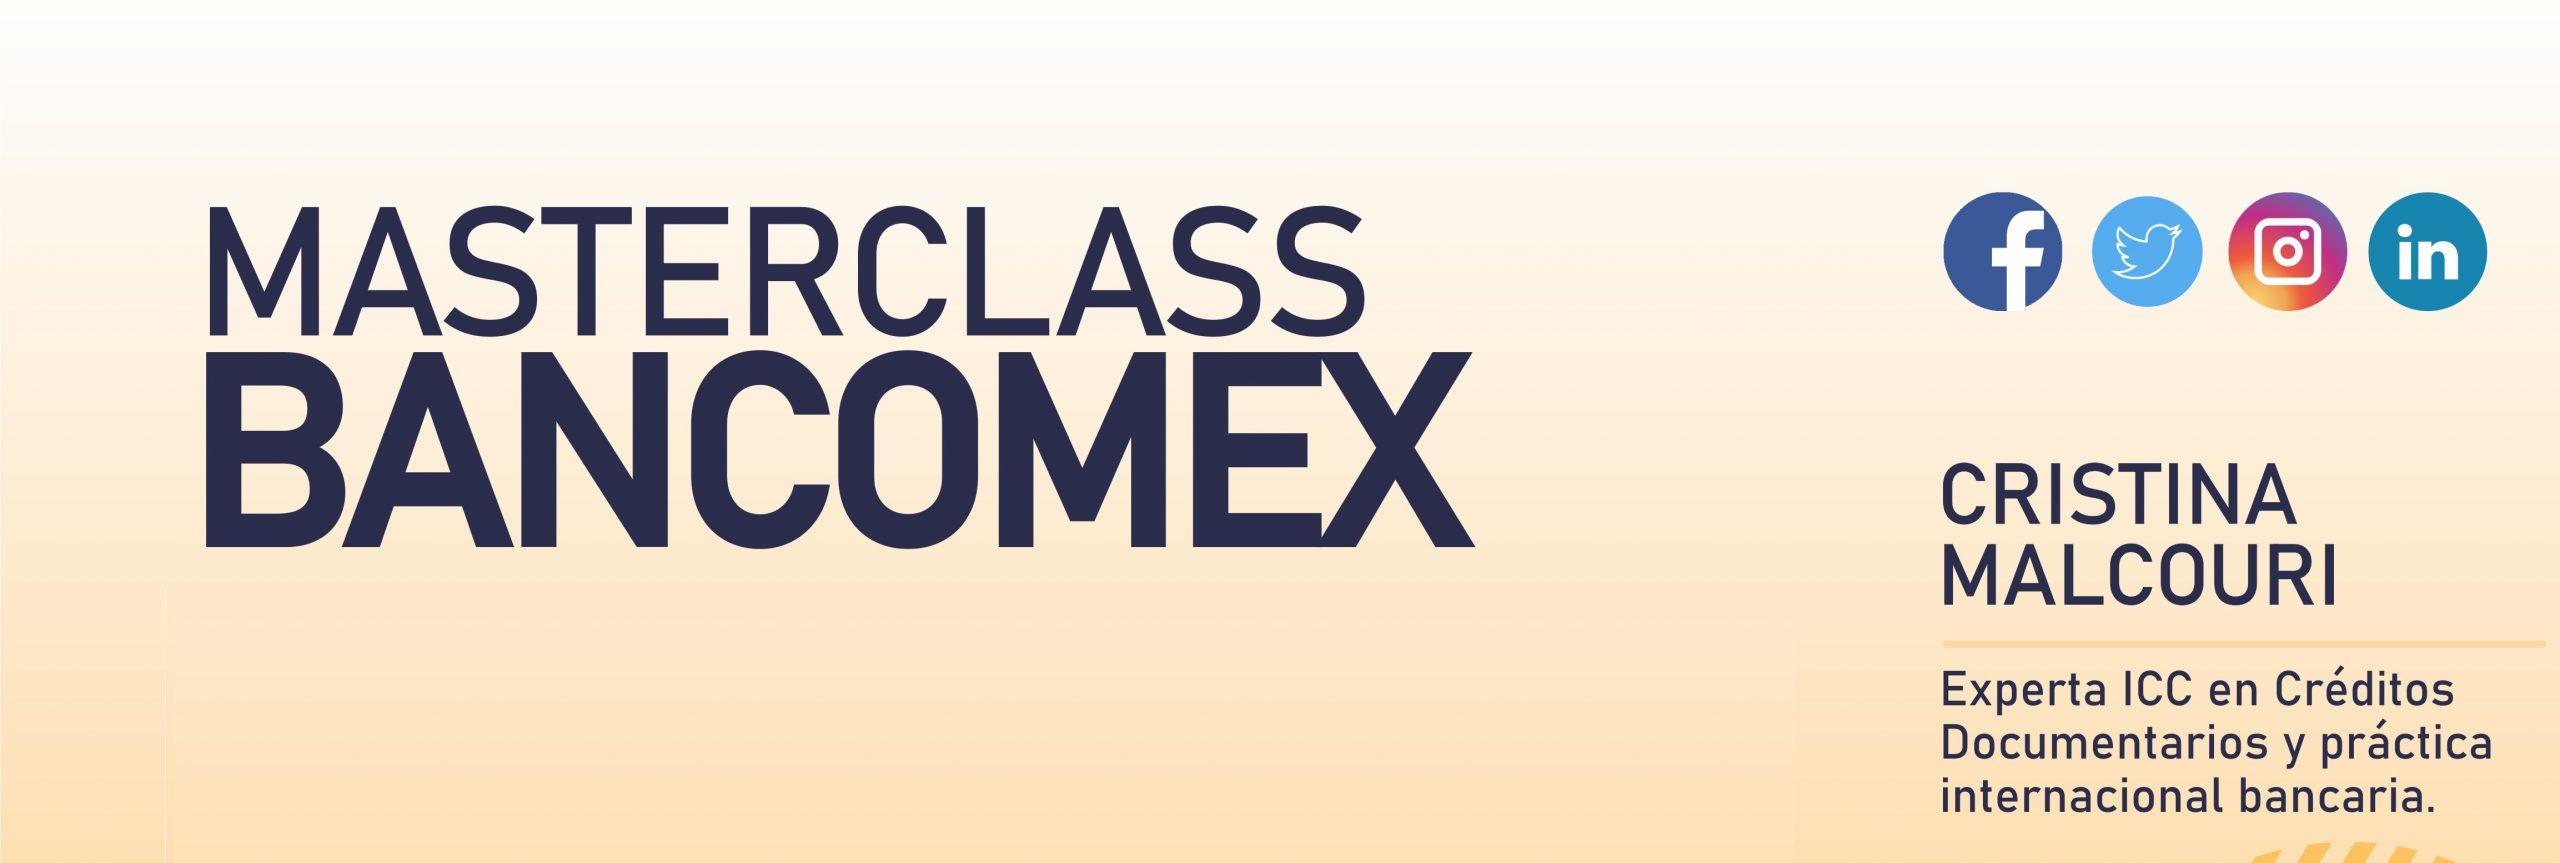 Masterclass BANCOMEX